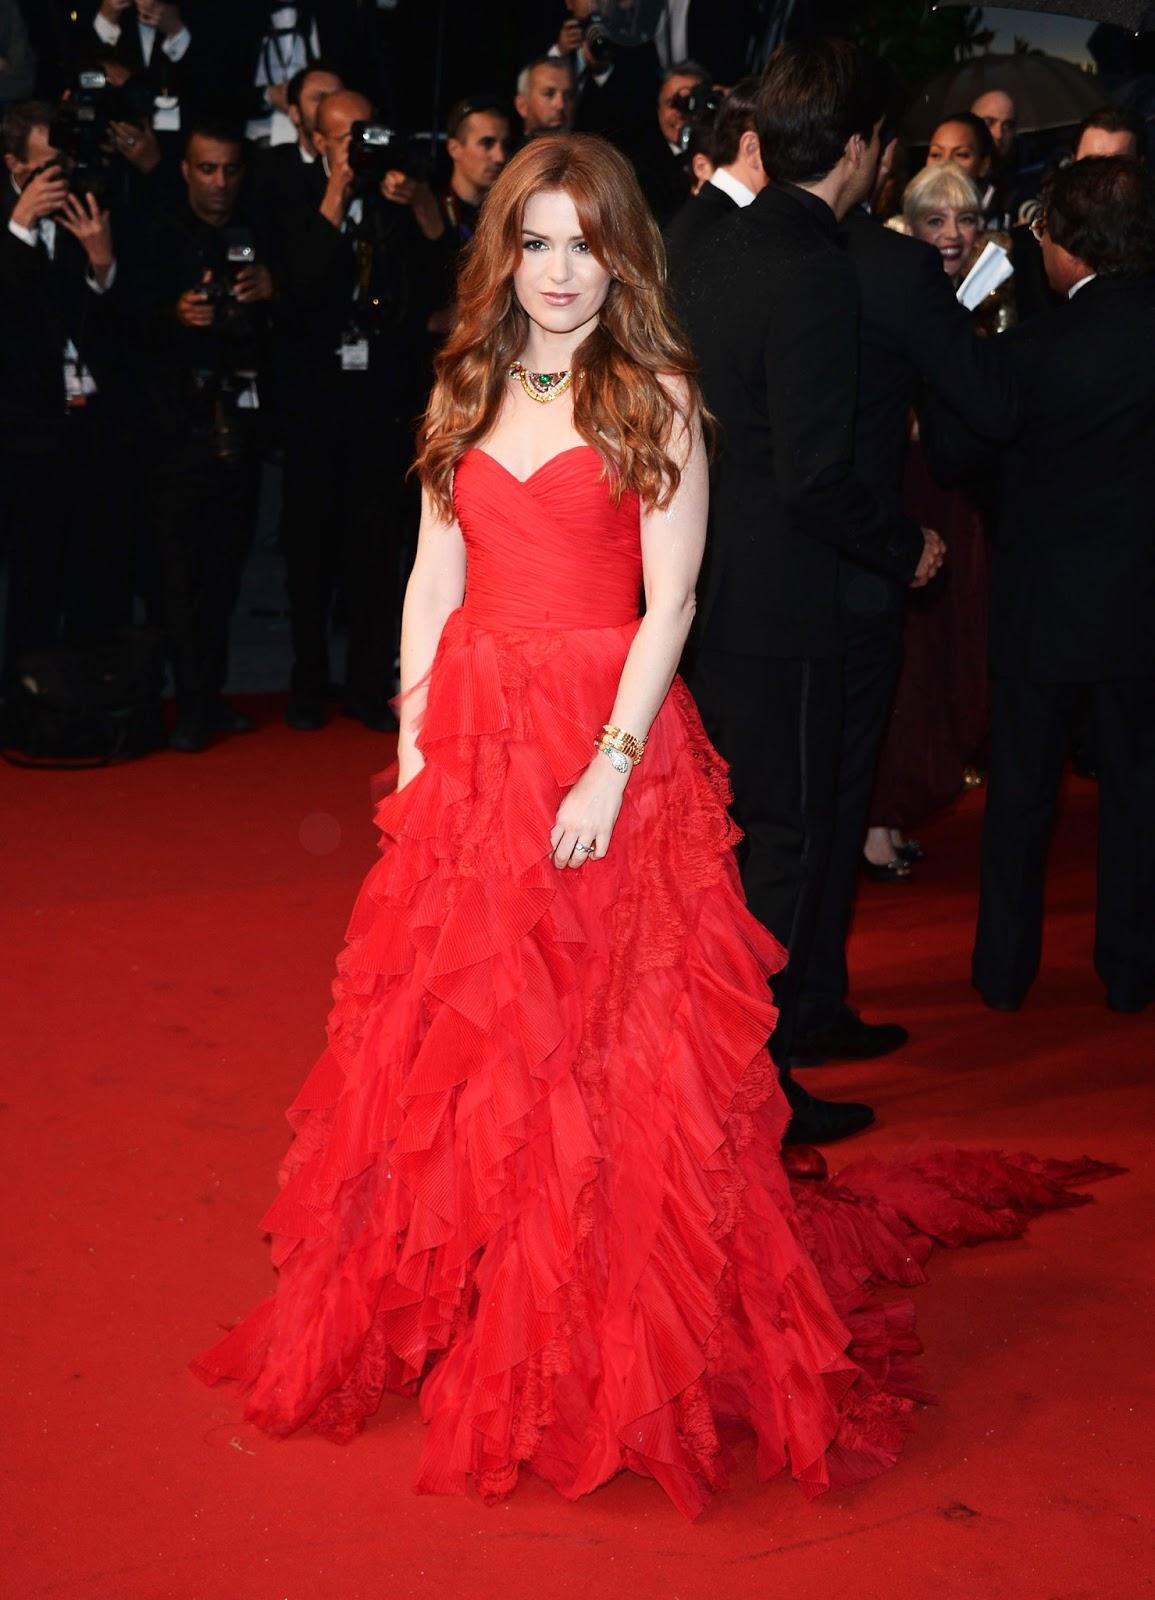 Isla Fisher de BVLGARI deslumbra en la alfombra roja de Cannes